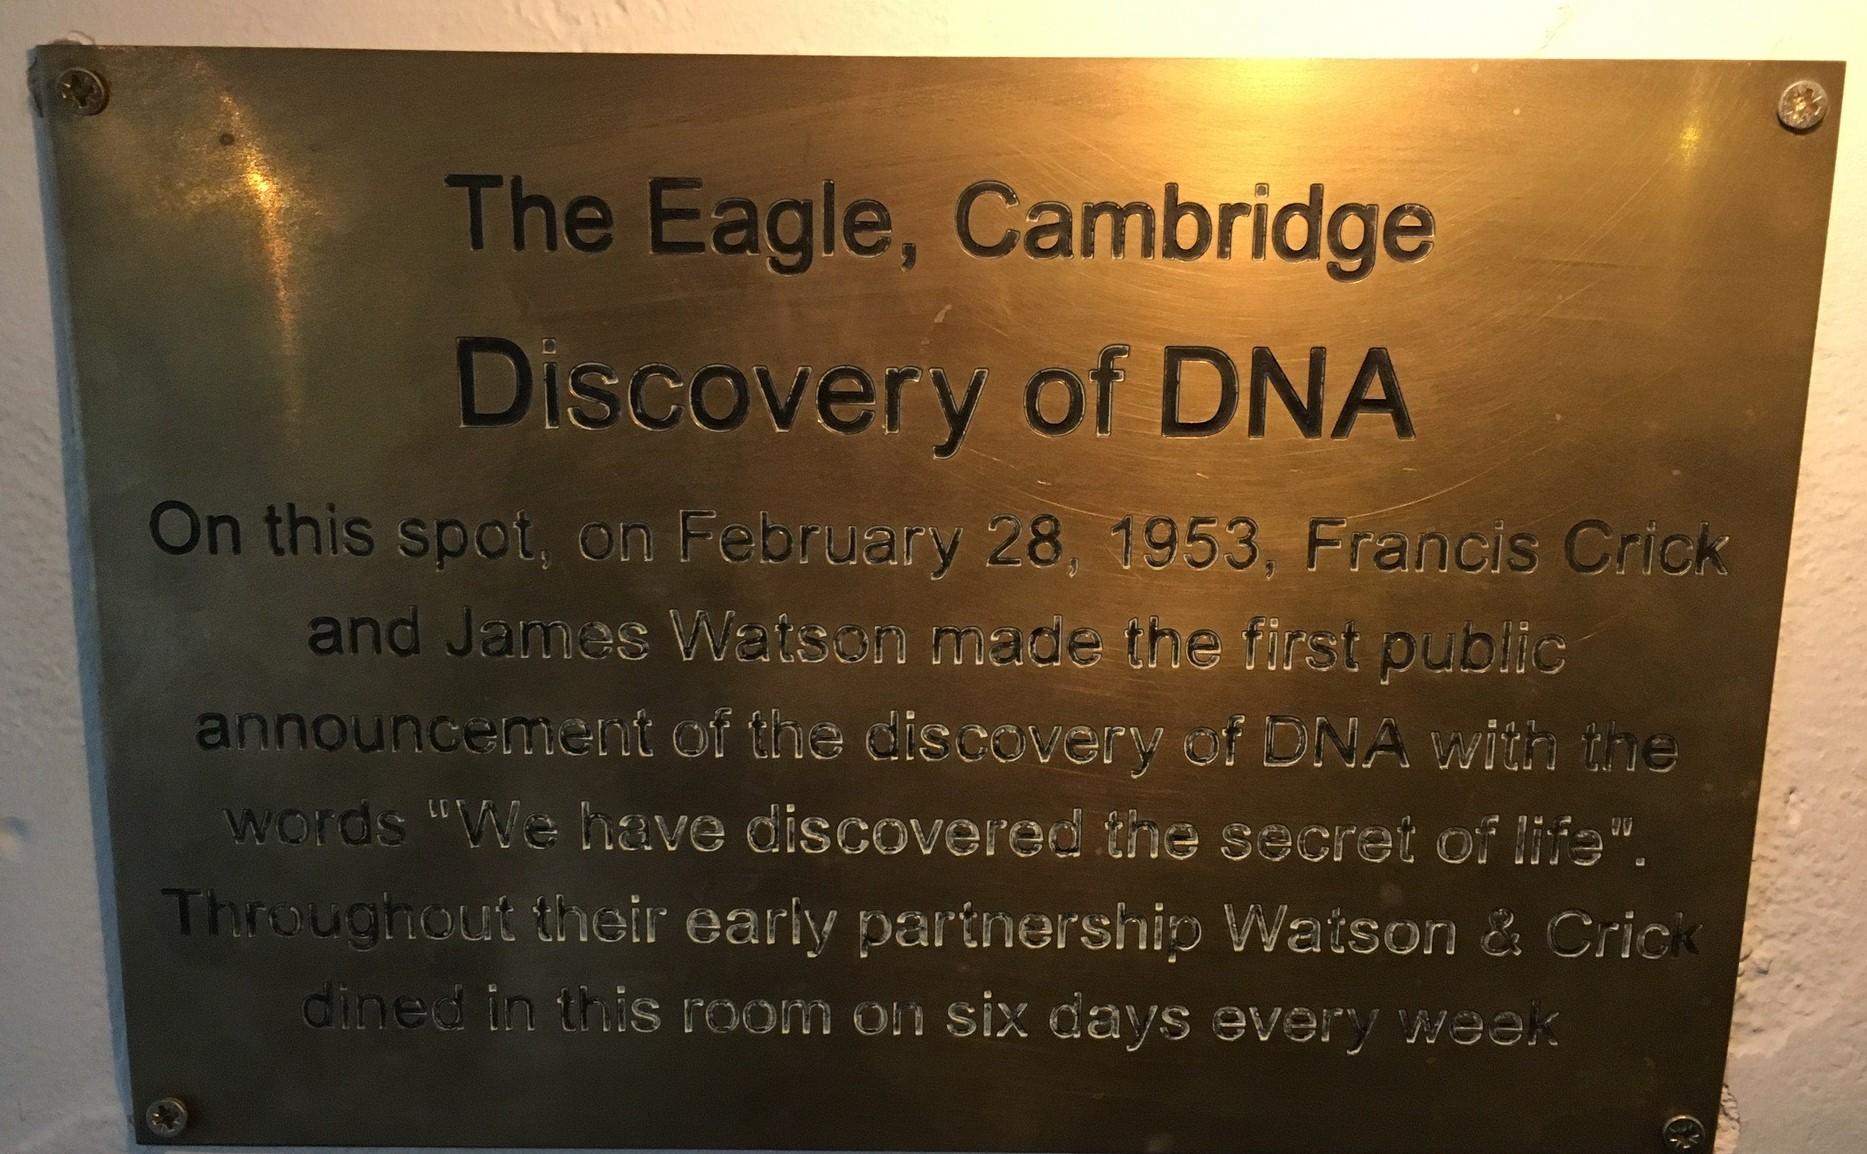 The Eagle, Cambridge plaque